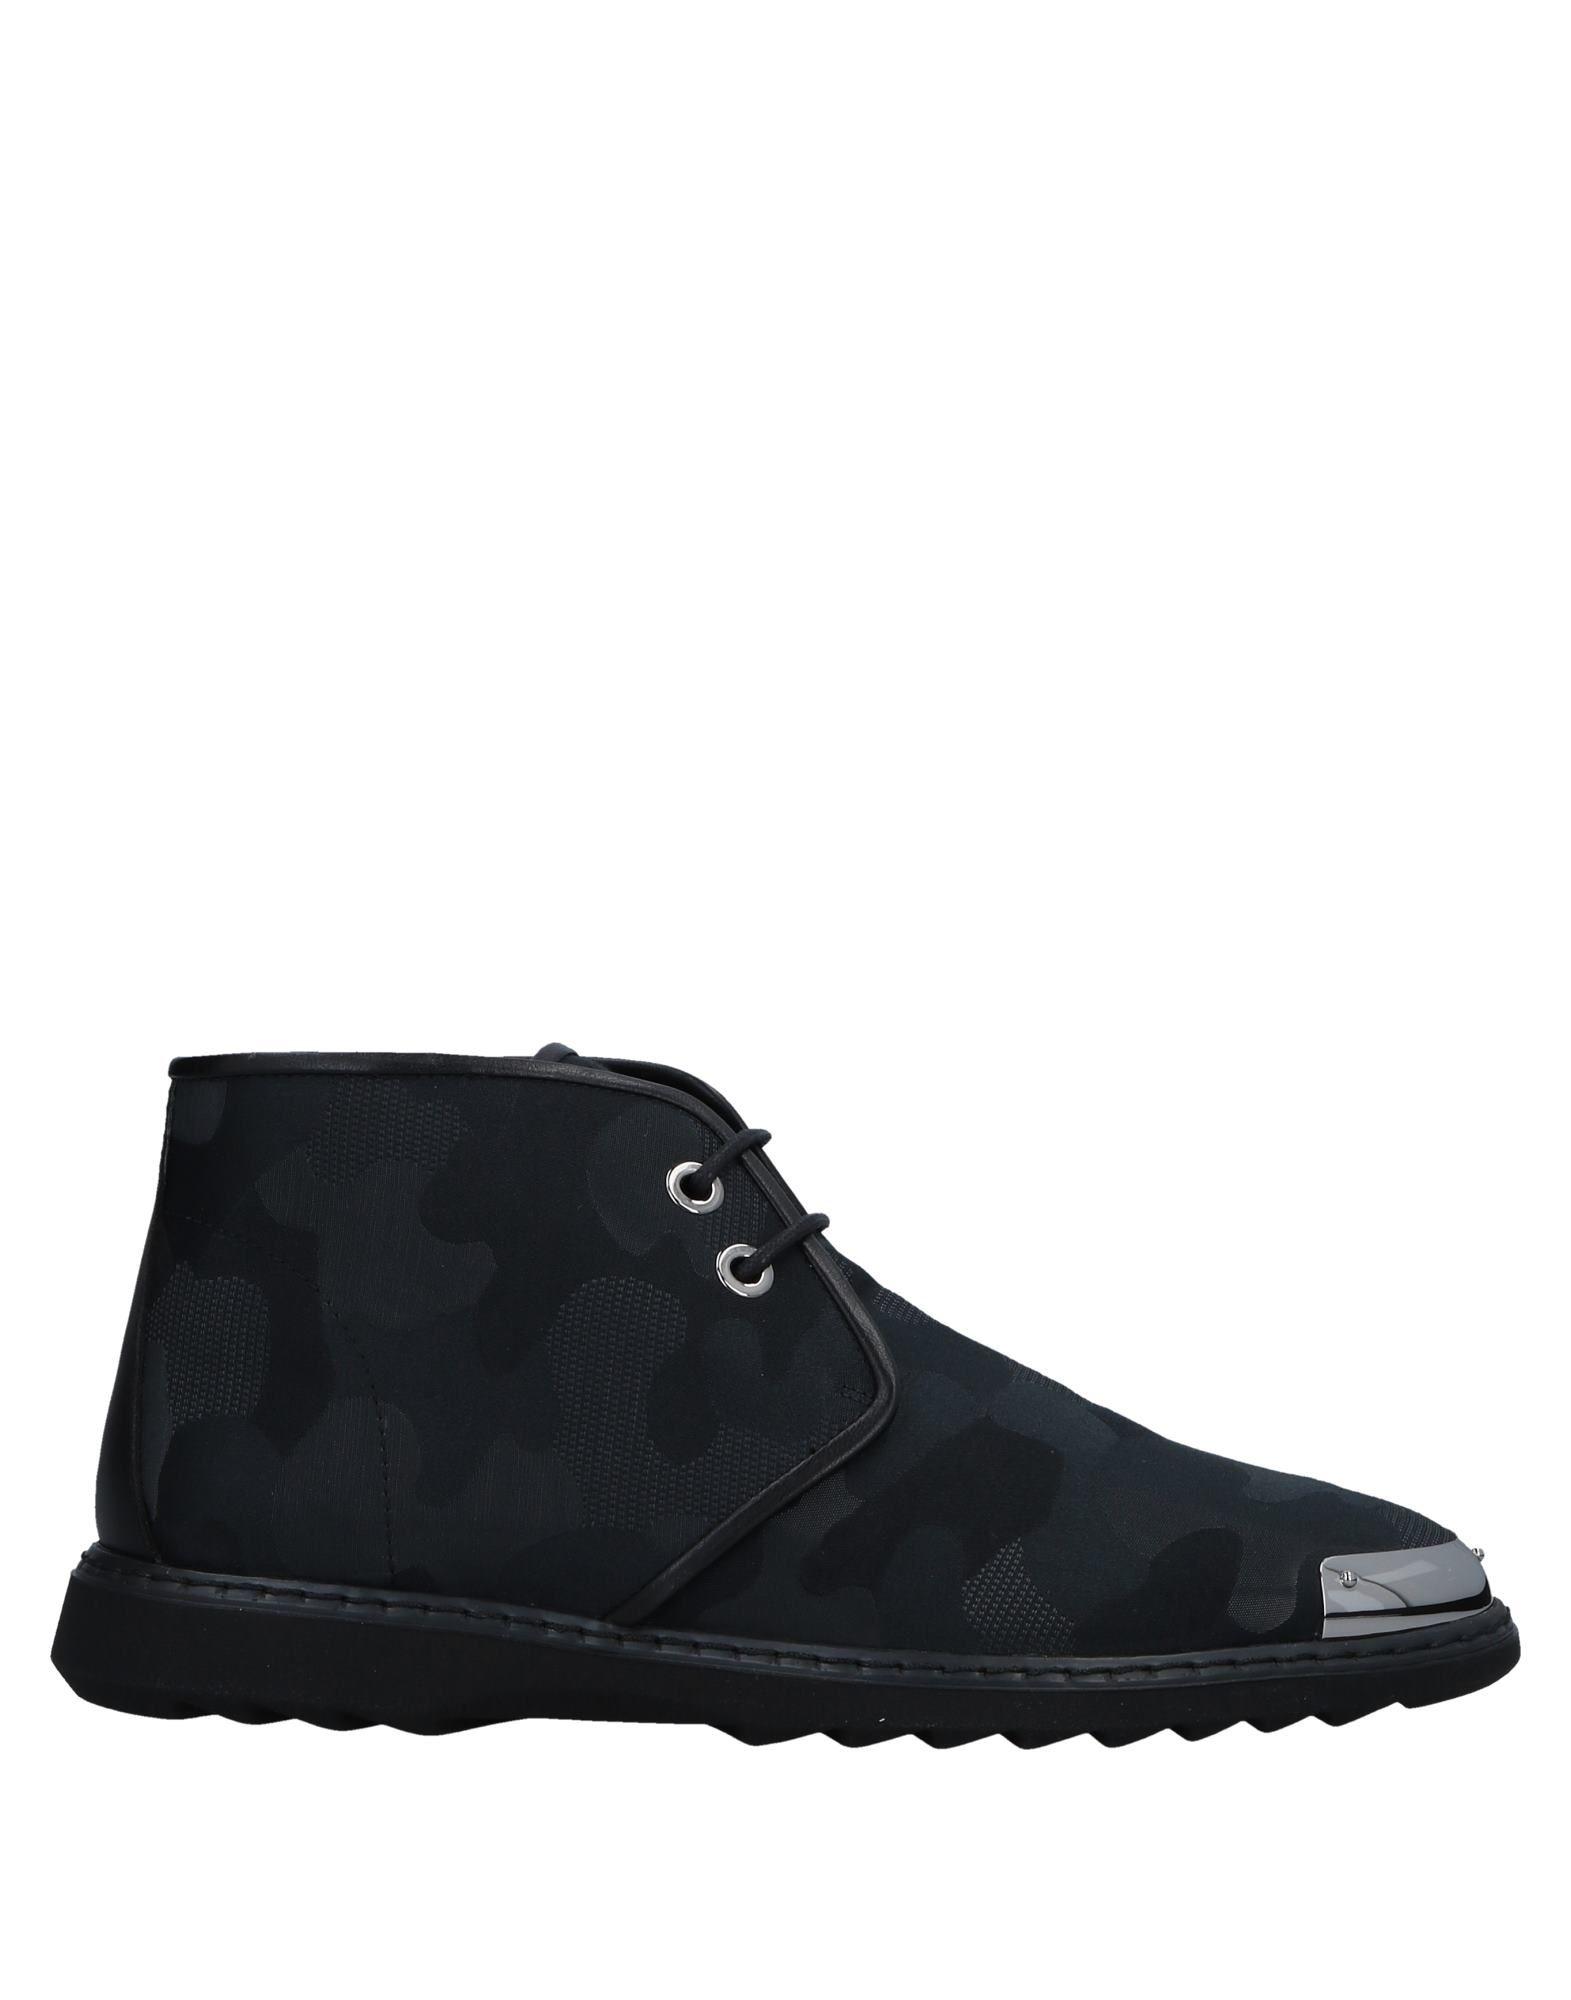 Giuseppe Zanotti Stiefelette Herren  11517755NG Gute Qualität beliebte Schuhe